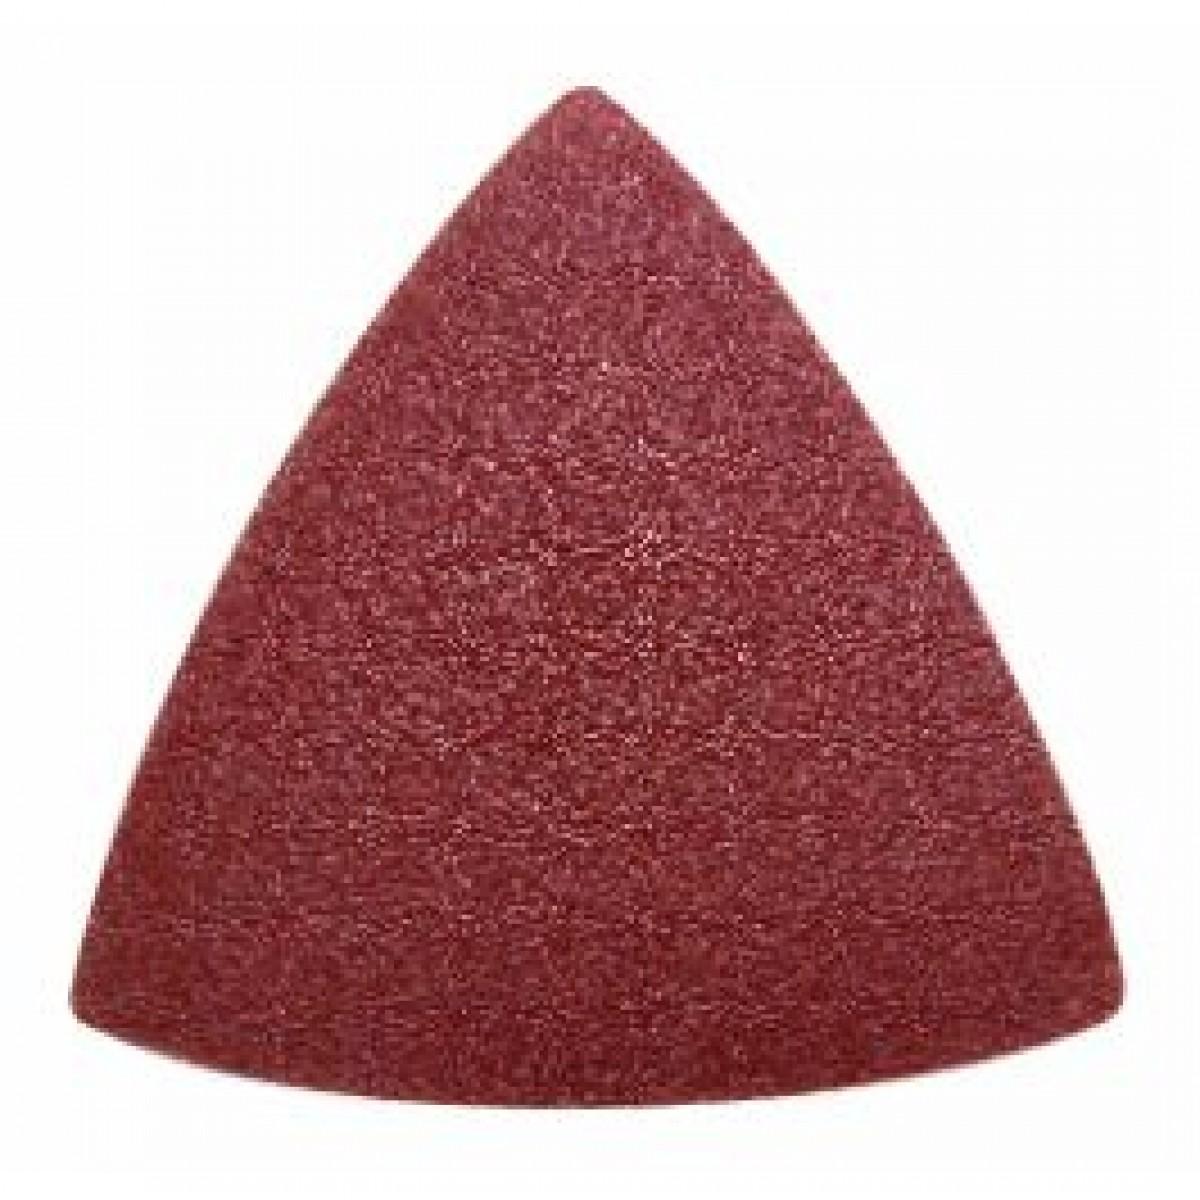 80 Grit Triangular Sanding Sheets 5 Pack